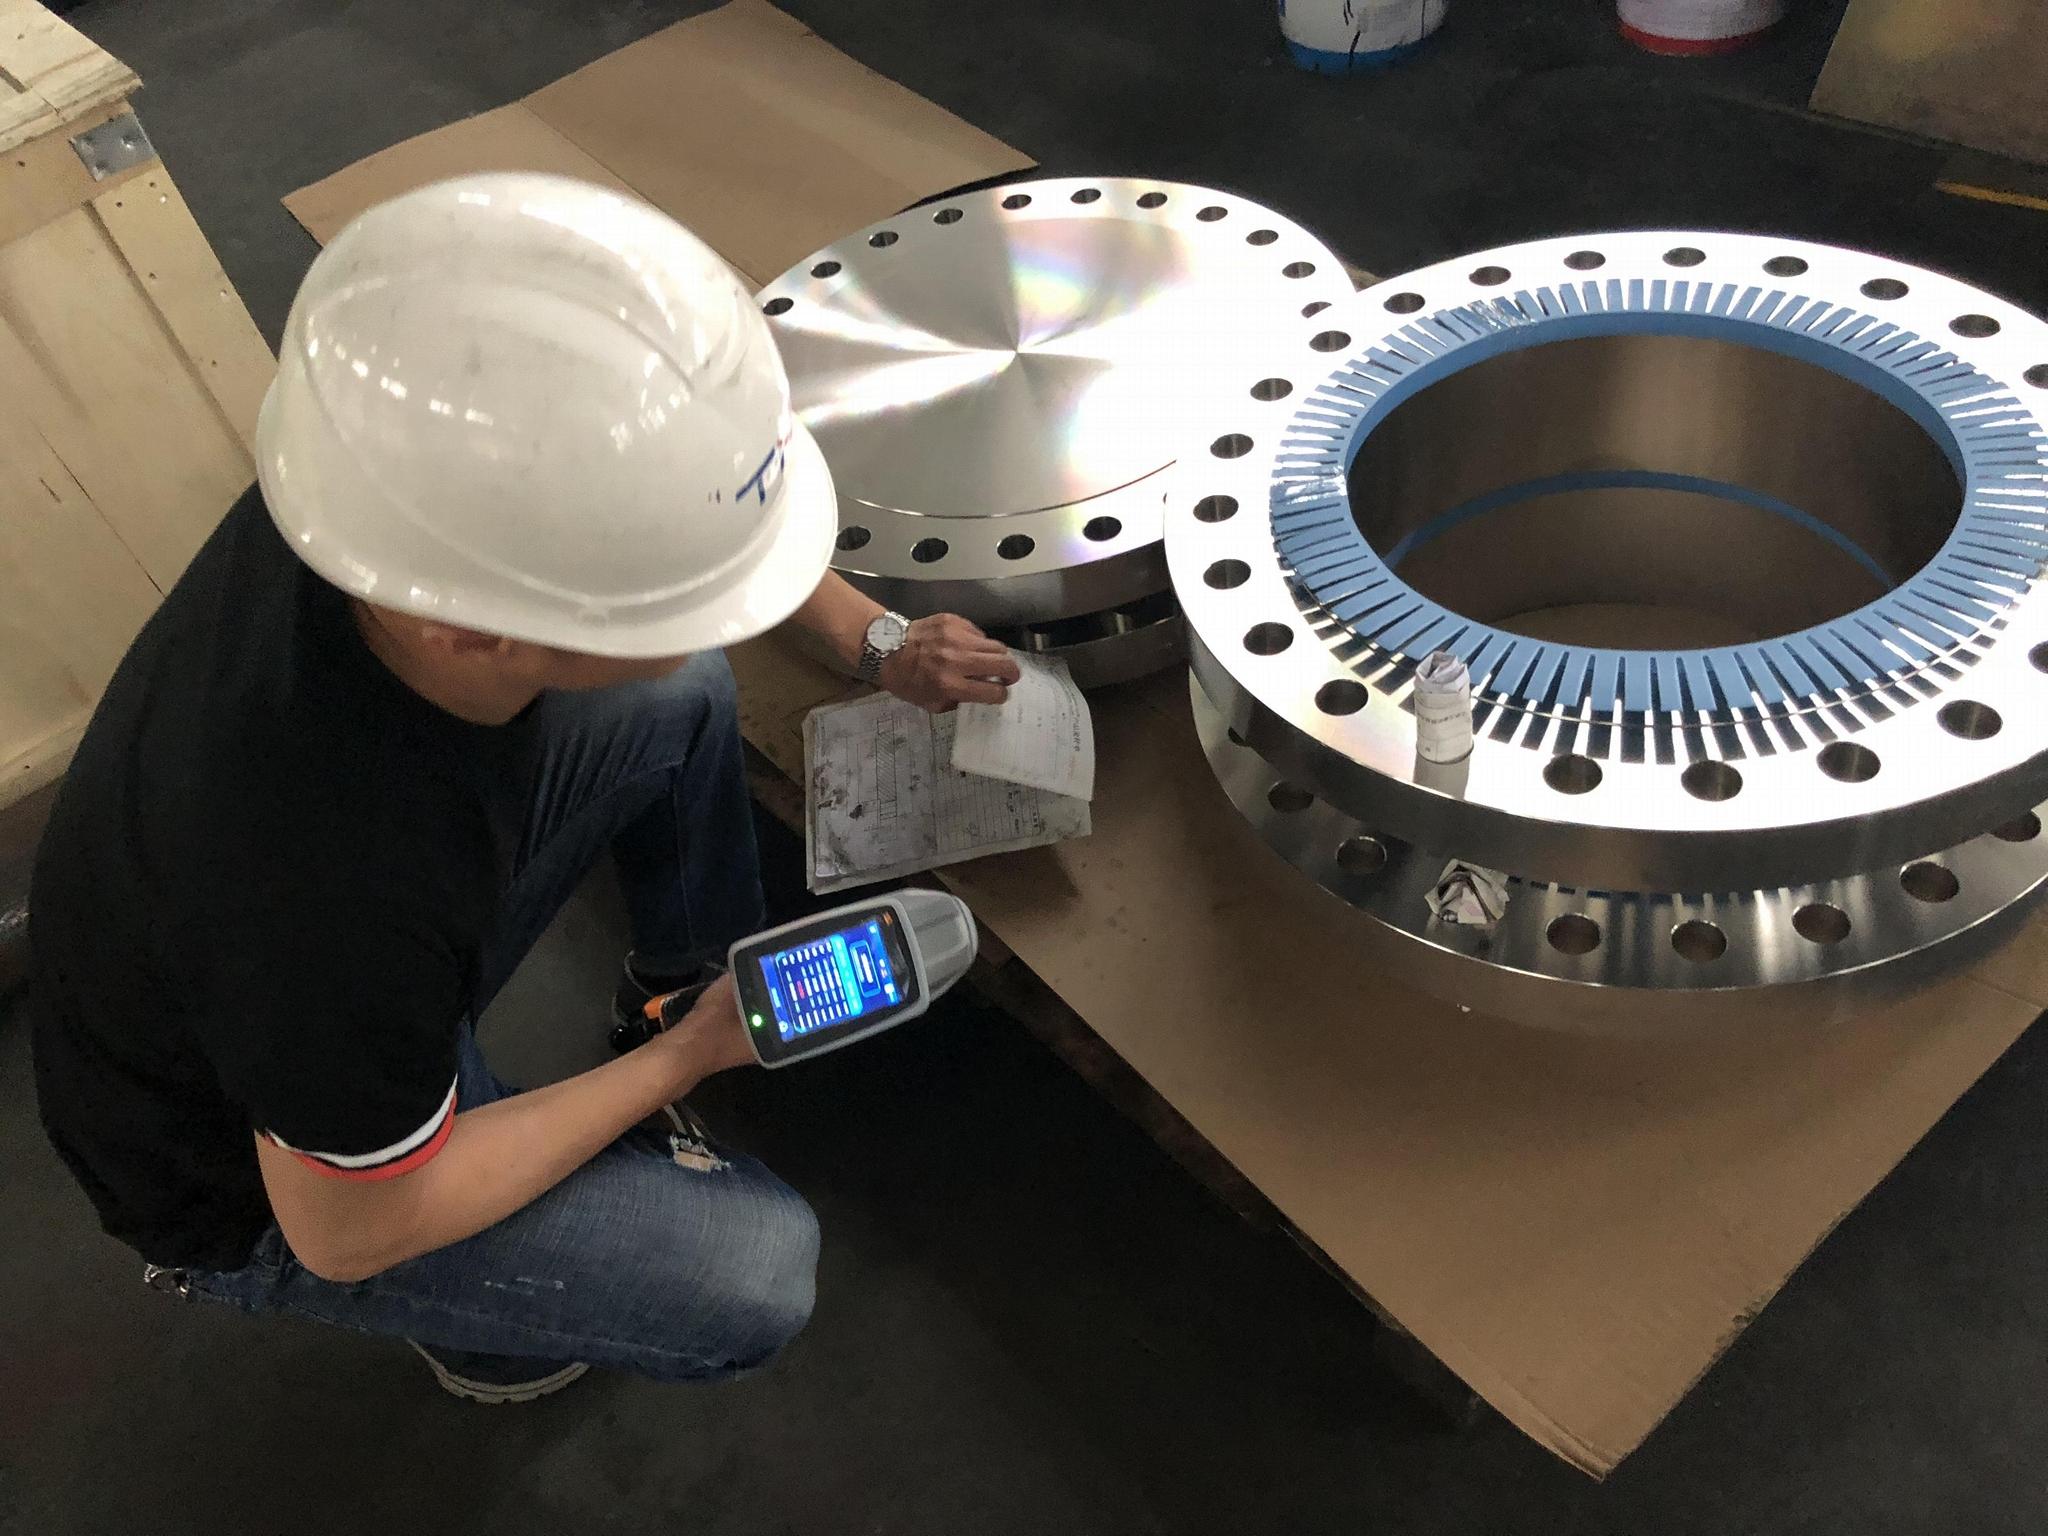 HP-VELA001 LIBS Analysis in Aluminium Alloy Factory